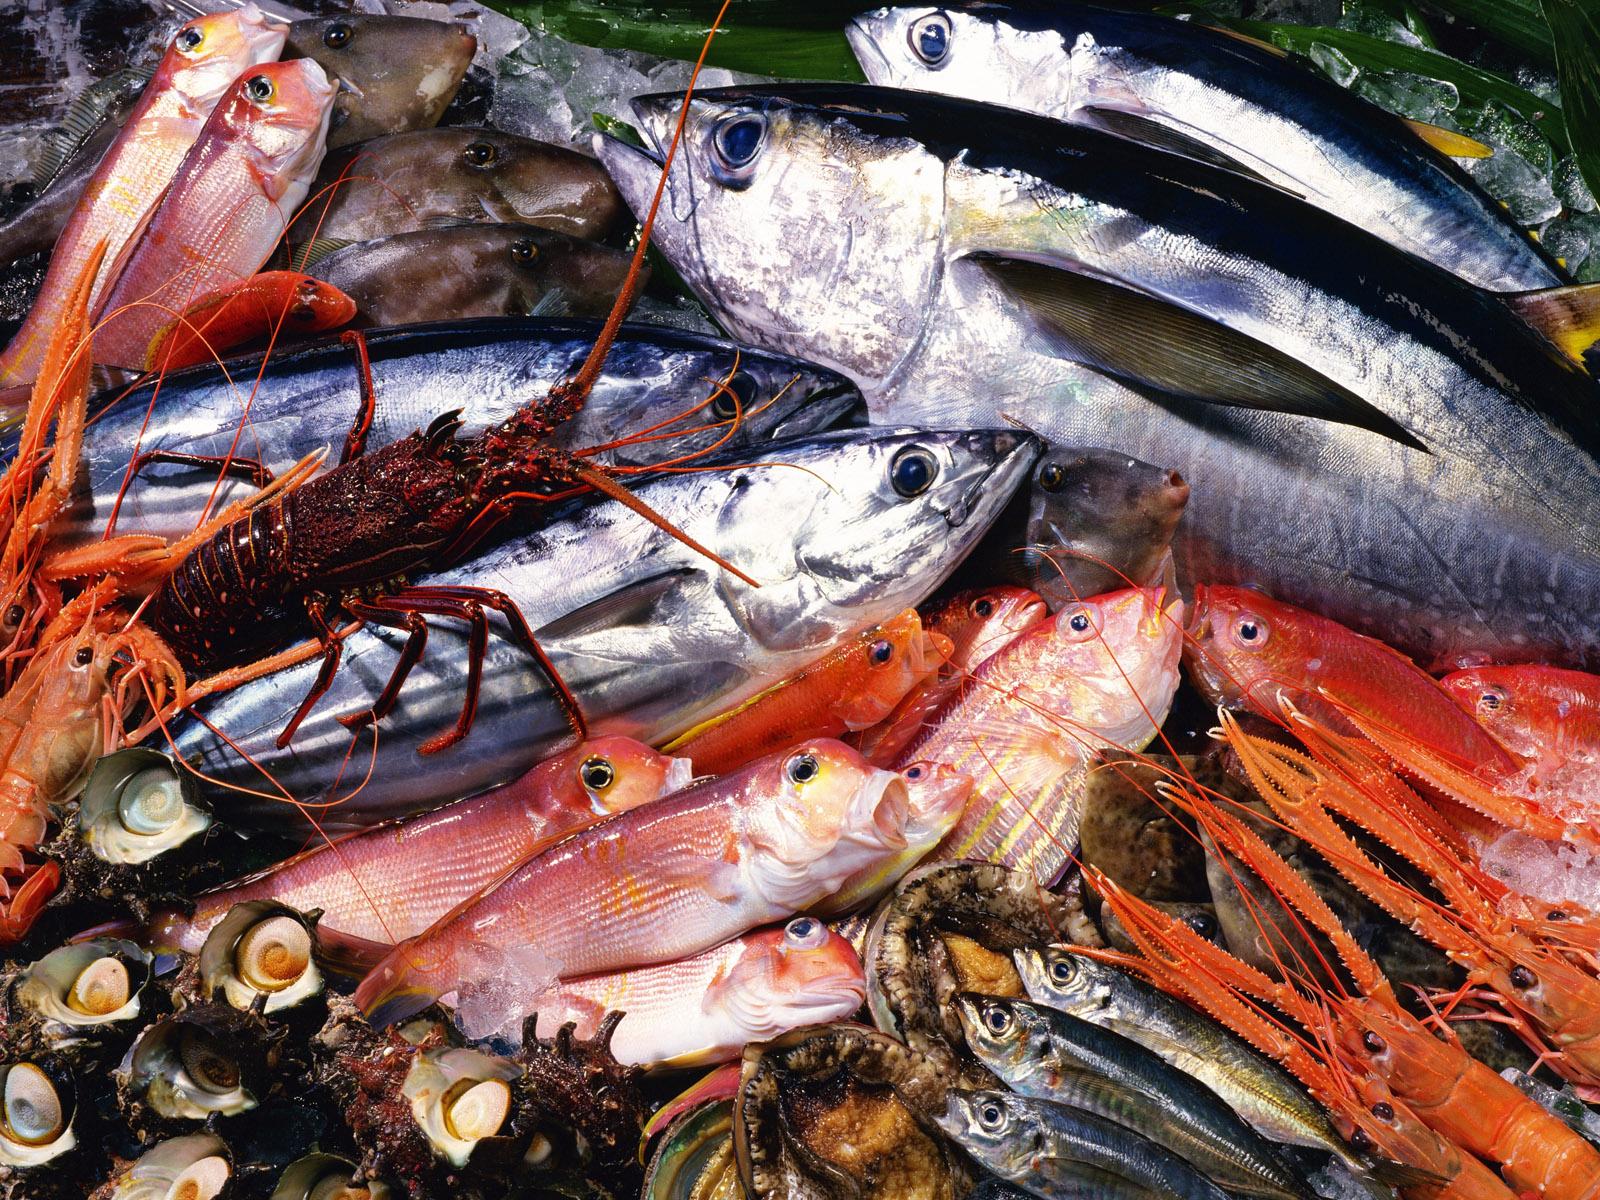 Seafood-53-NWKS5Q9CQR-1600x1200